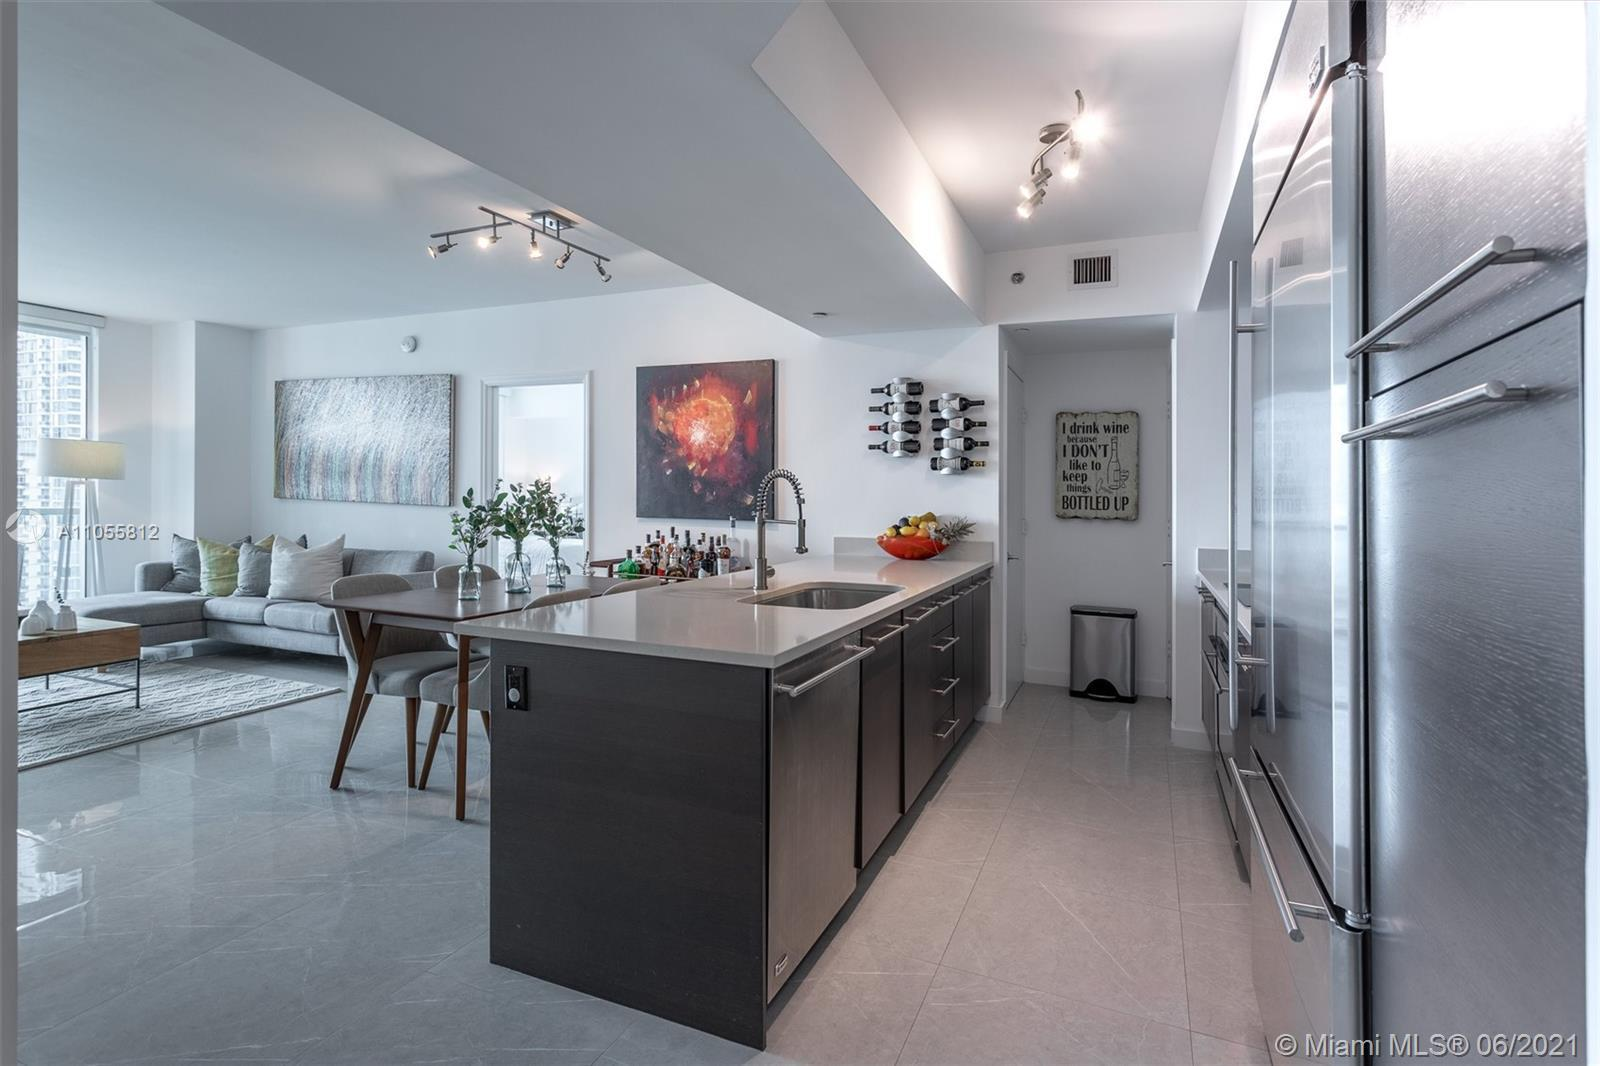 Gorgeous 2 bedrooms/2 bathrooms condo at the prestigious 500 Brickell condominium with river, bay an